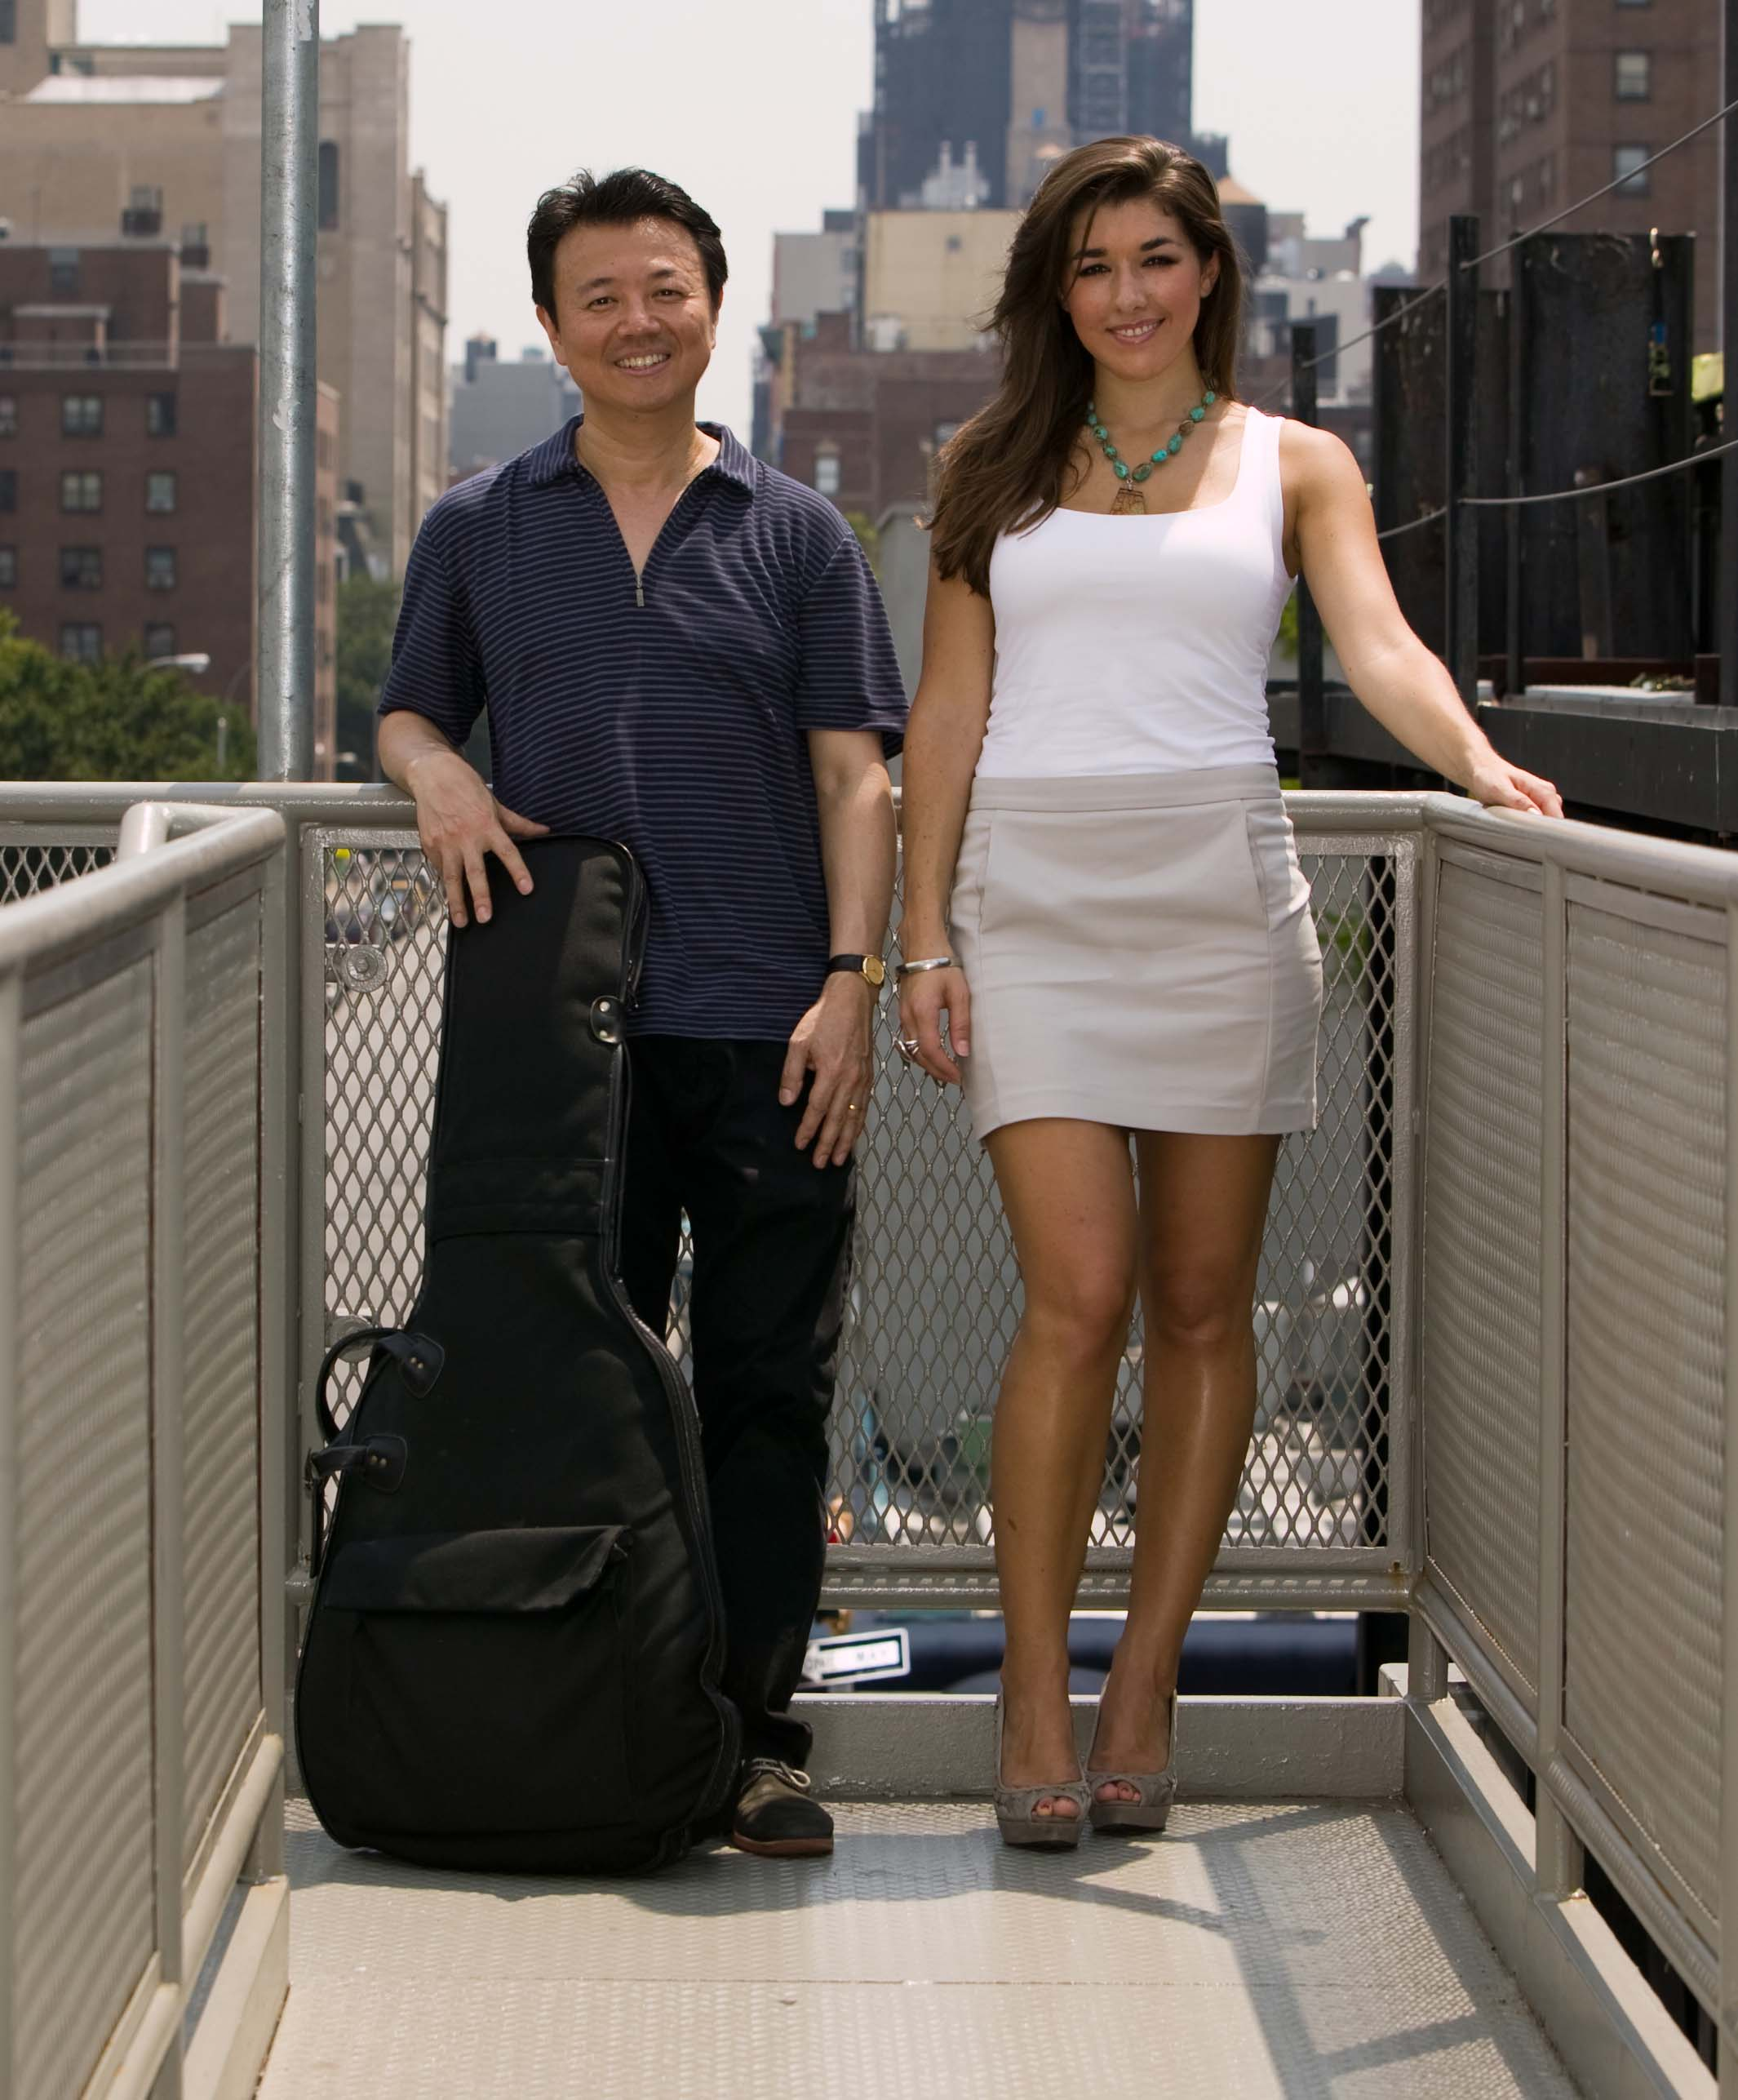 Gene Ess and Thana Alexa Duo